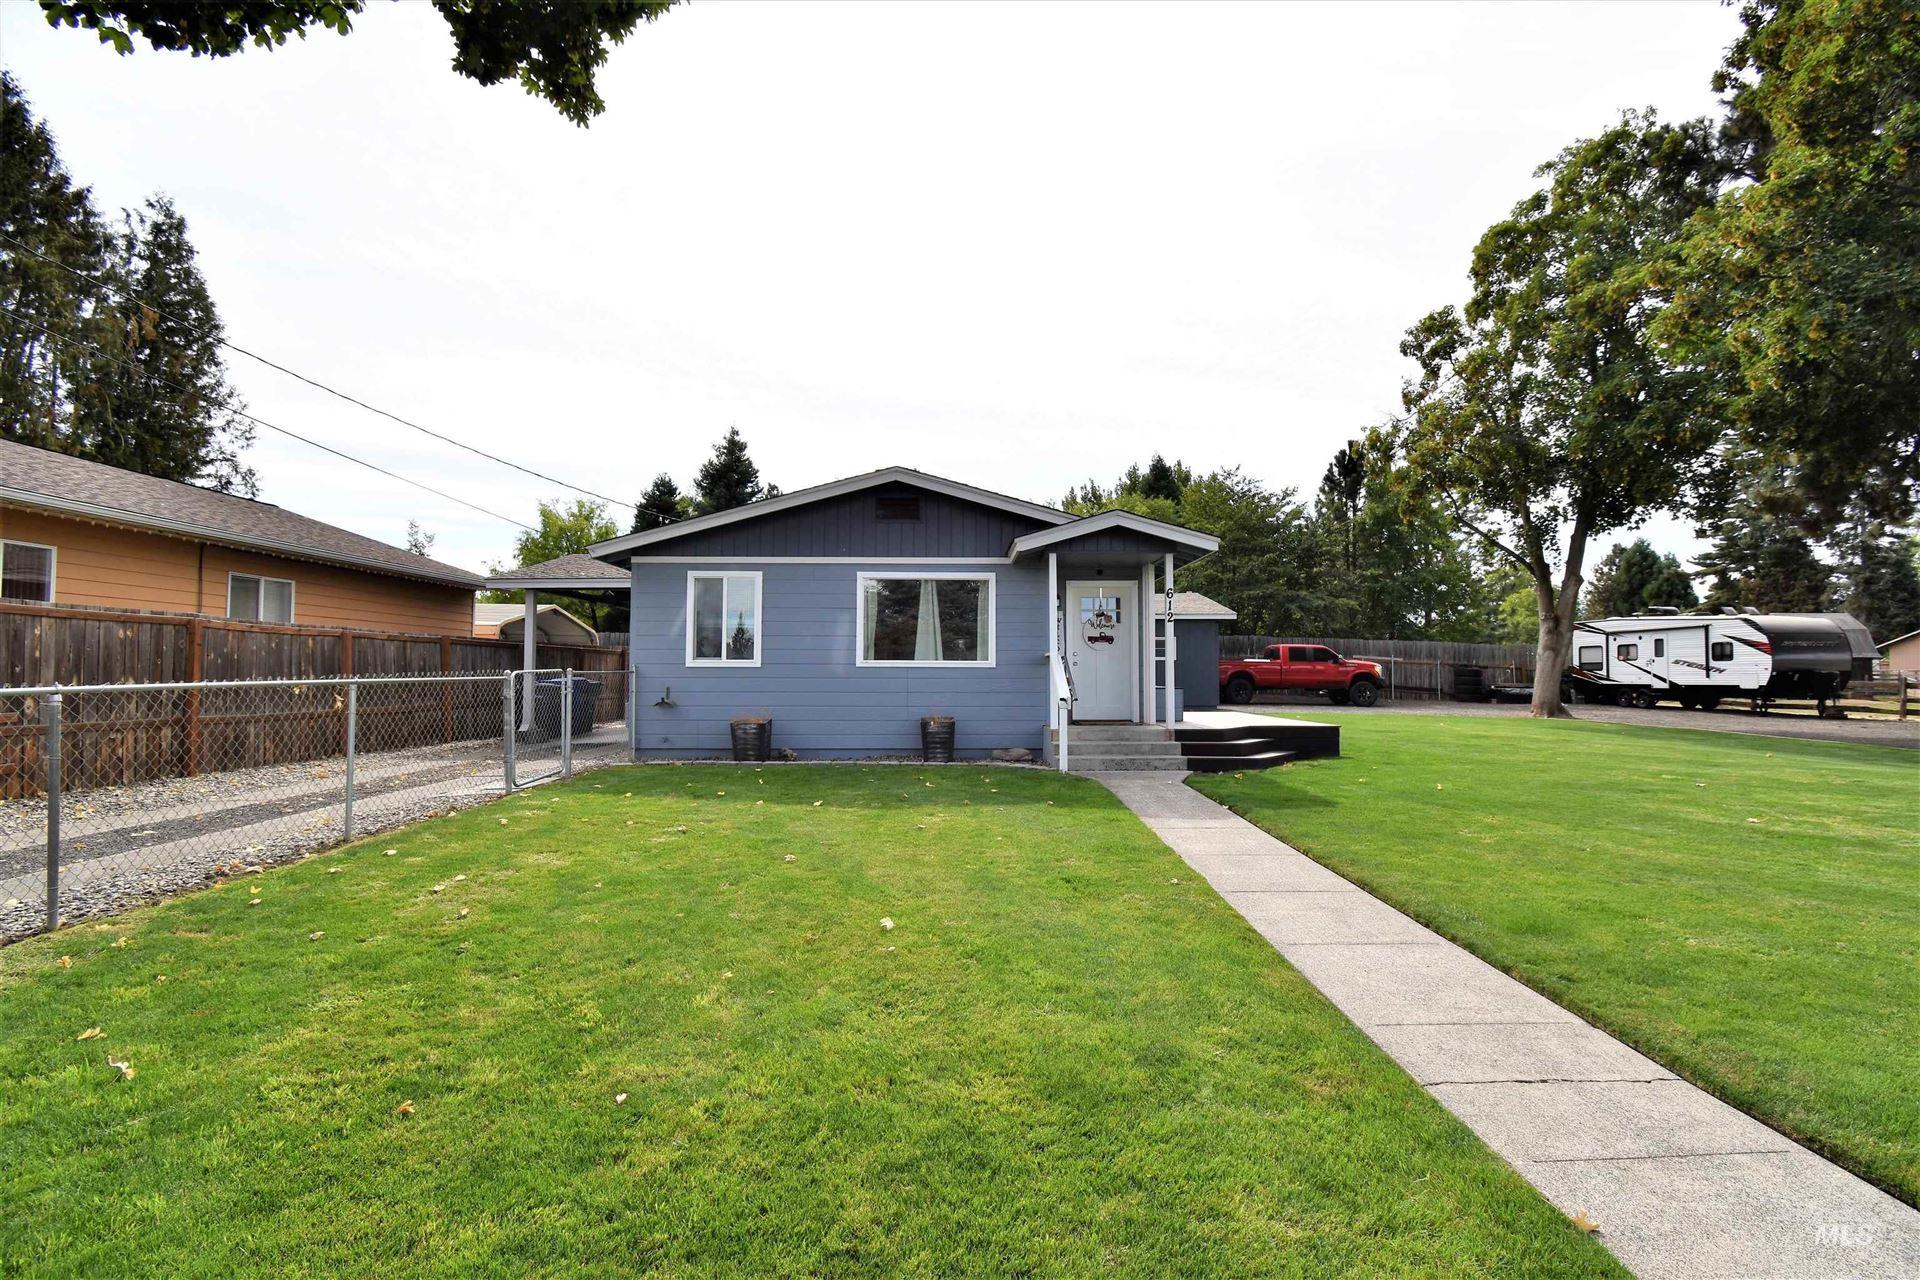 Photo of 612 Vista Ave, Lewiston, ID 83501 (MLS # 98819395)